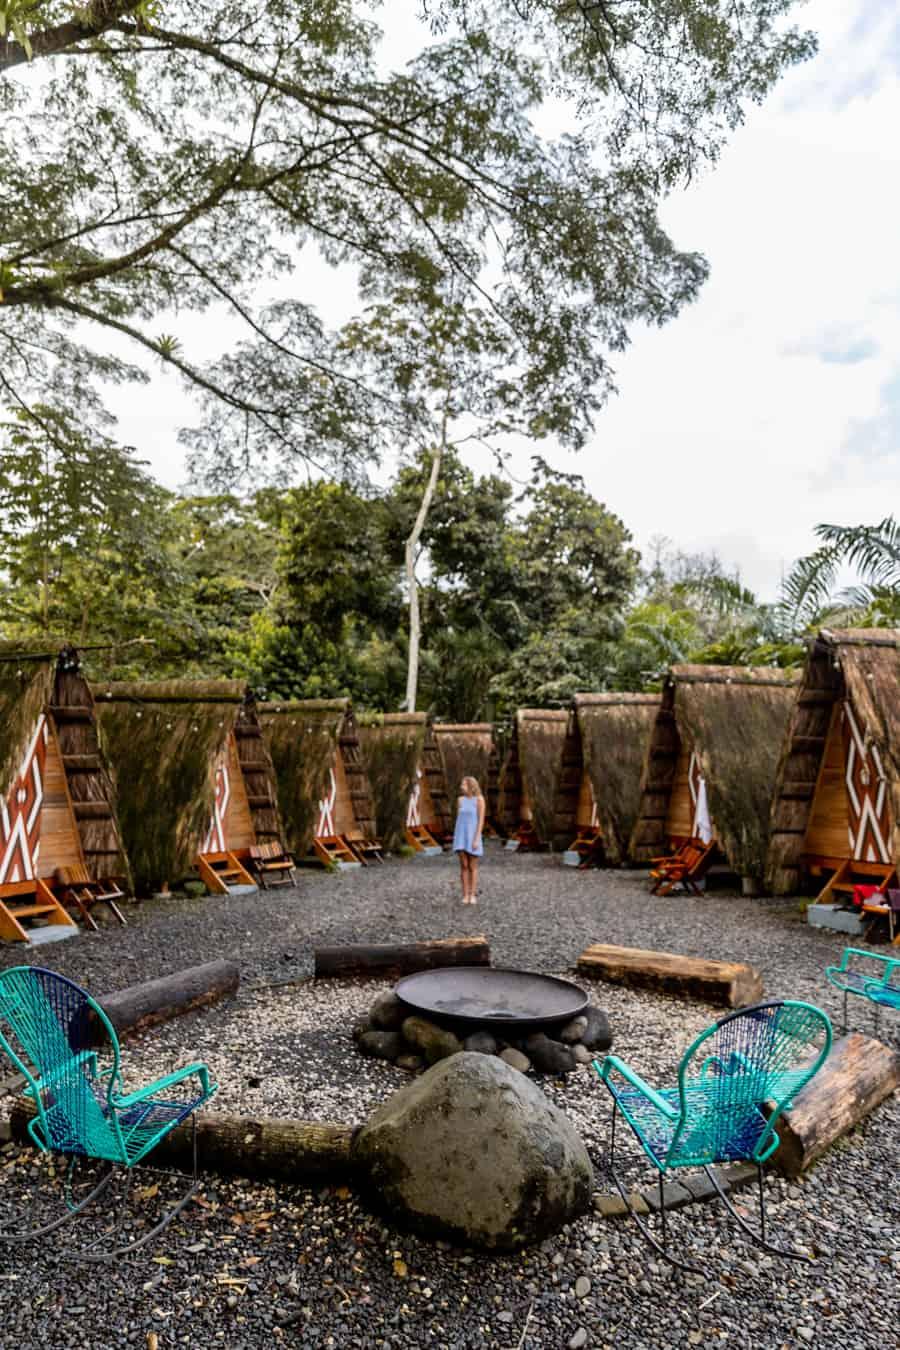 Costa Rica Travel Guide - The Passport Couple at Tee-Pee Hostel - Selina Hostel La Fortuna, Costa Rica